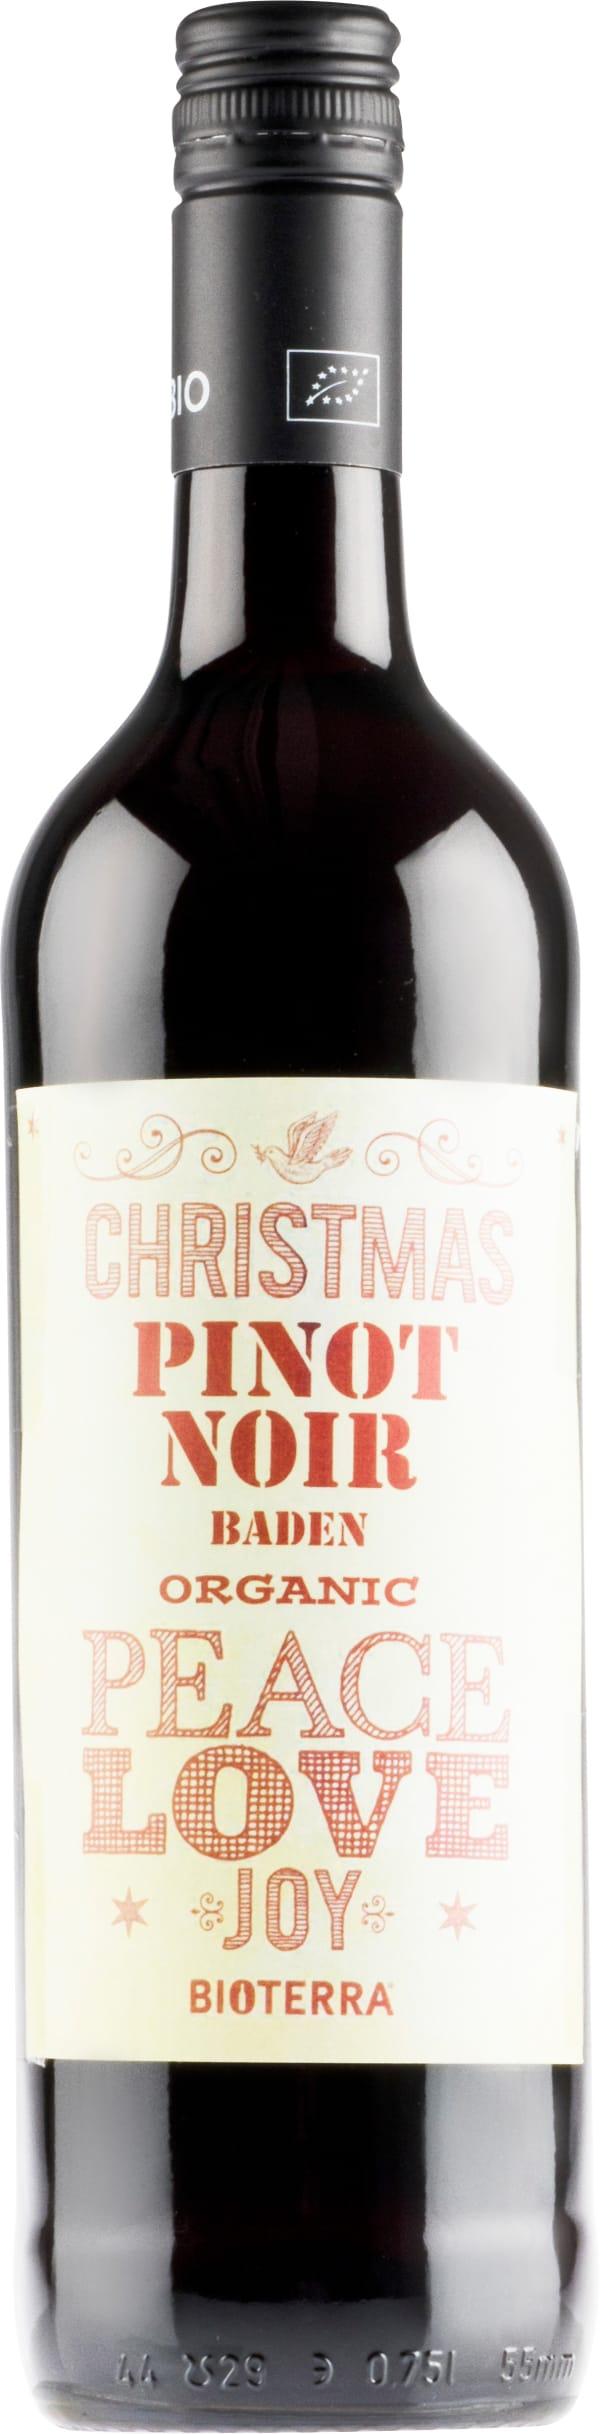 Christmas Organic Pinot Noir Peace Love Joy 2018